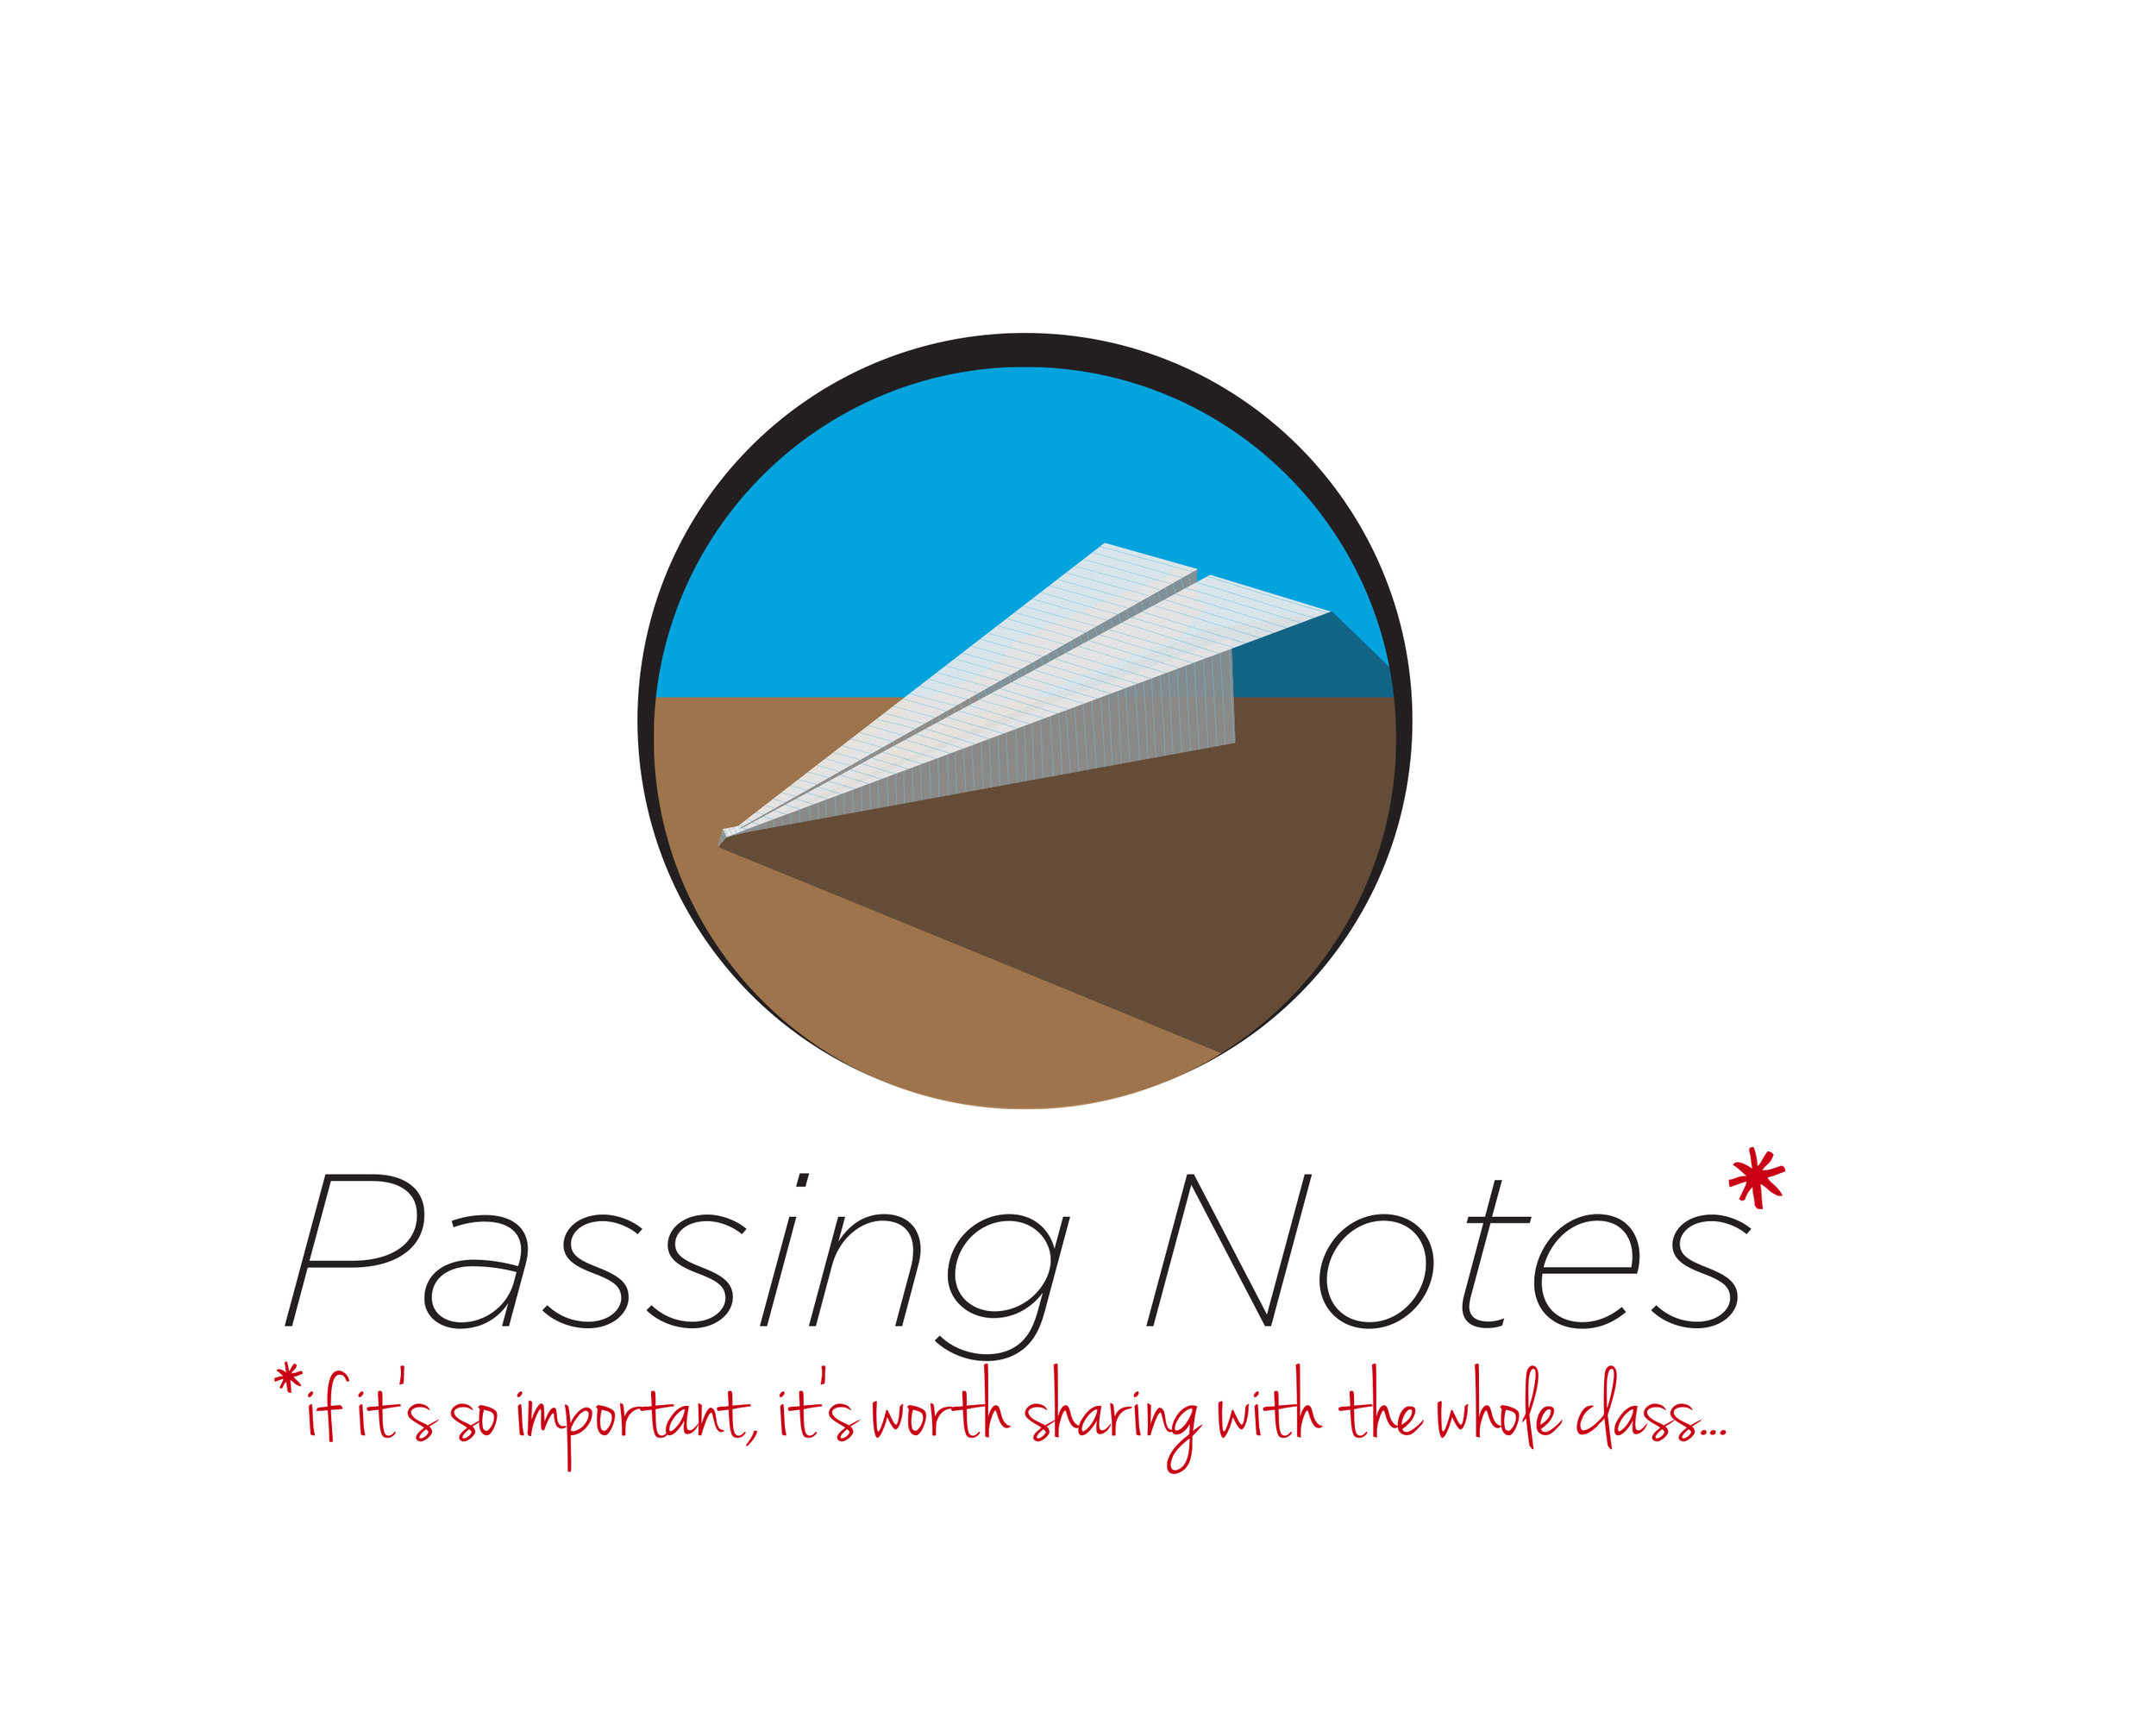 passing notes.jpg